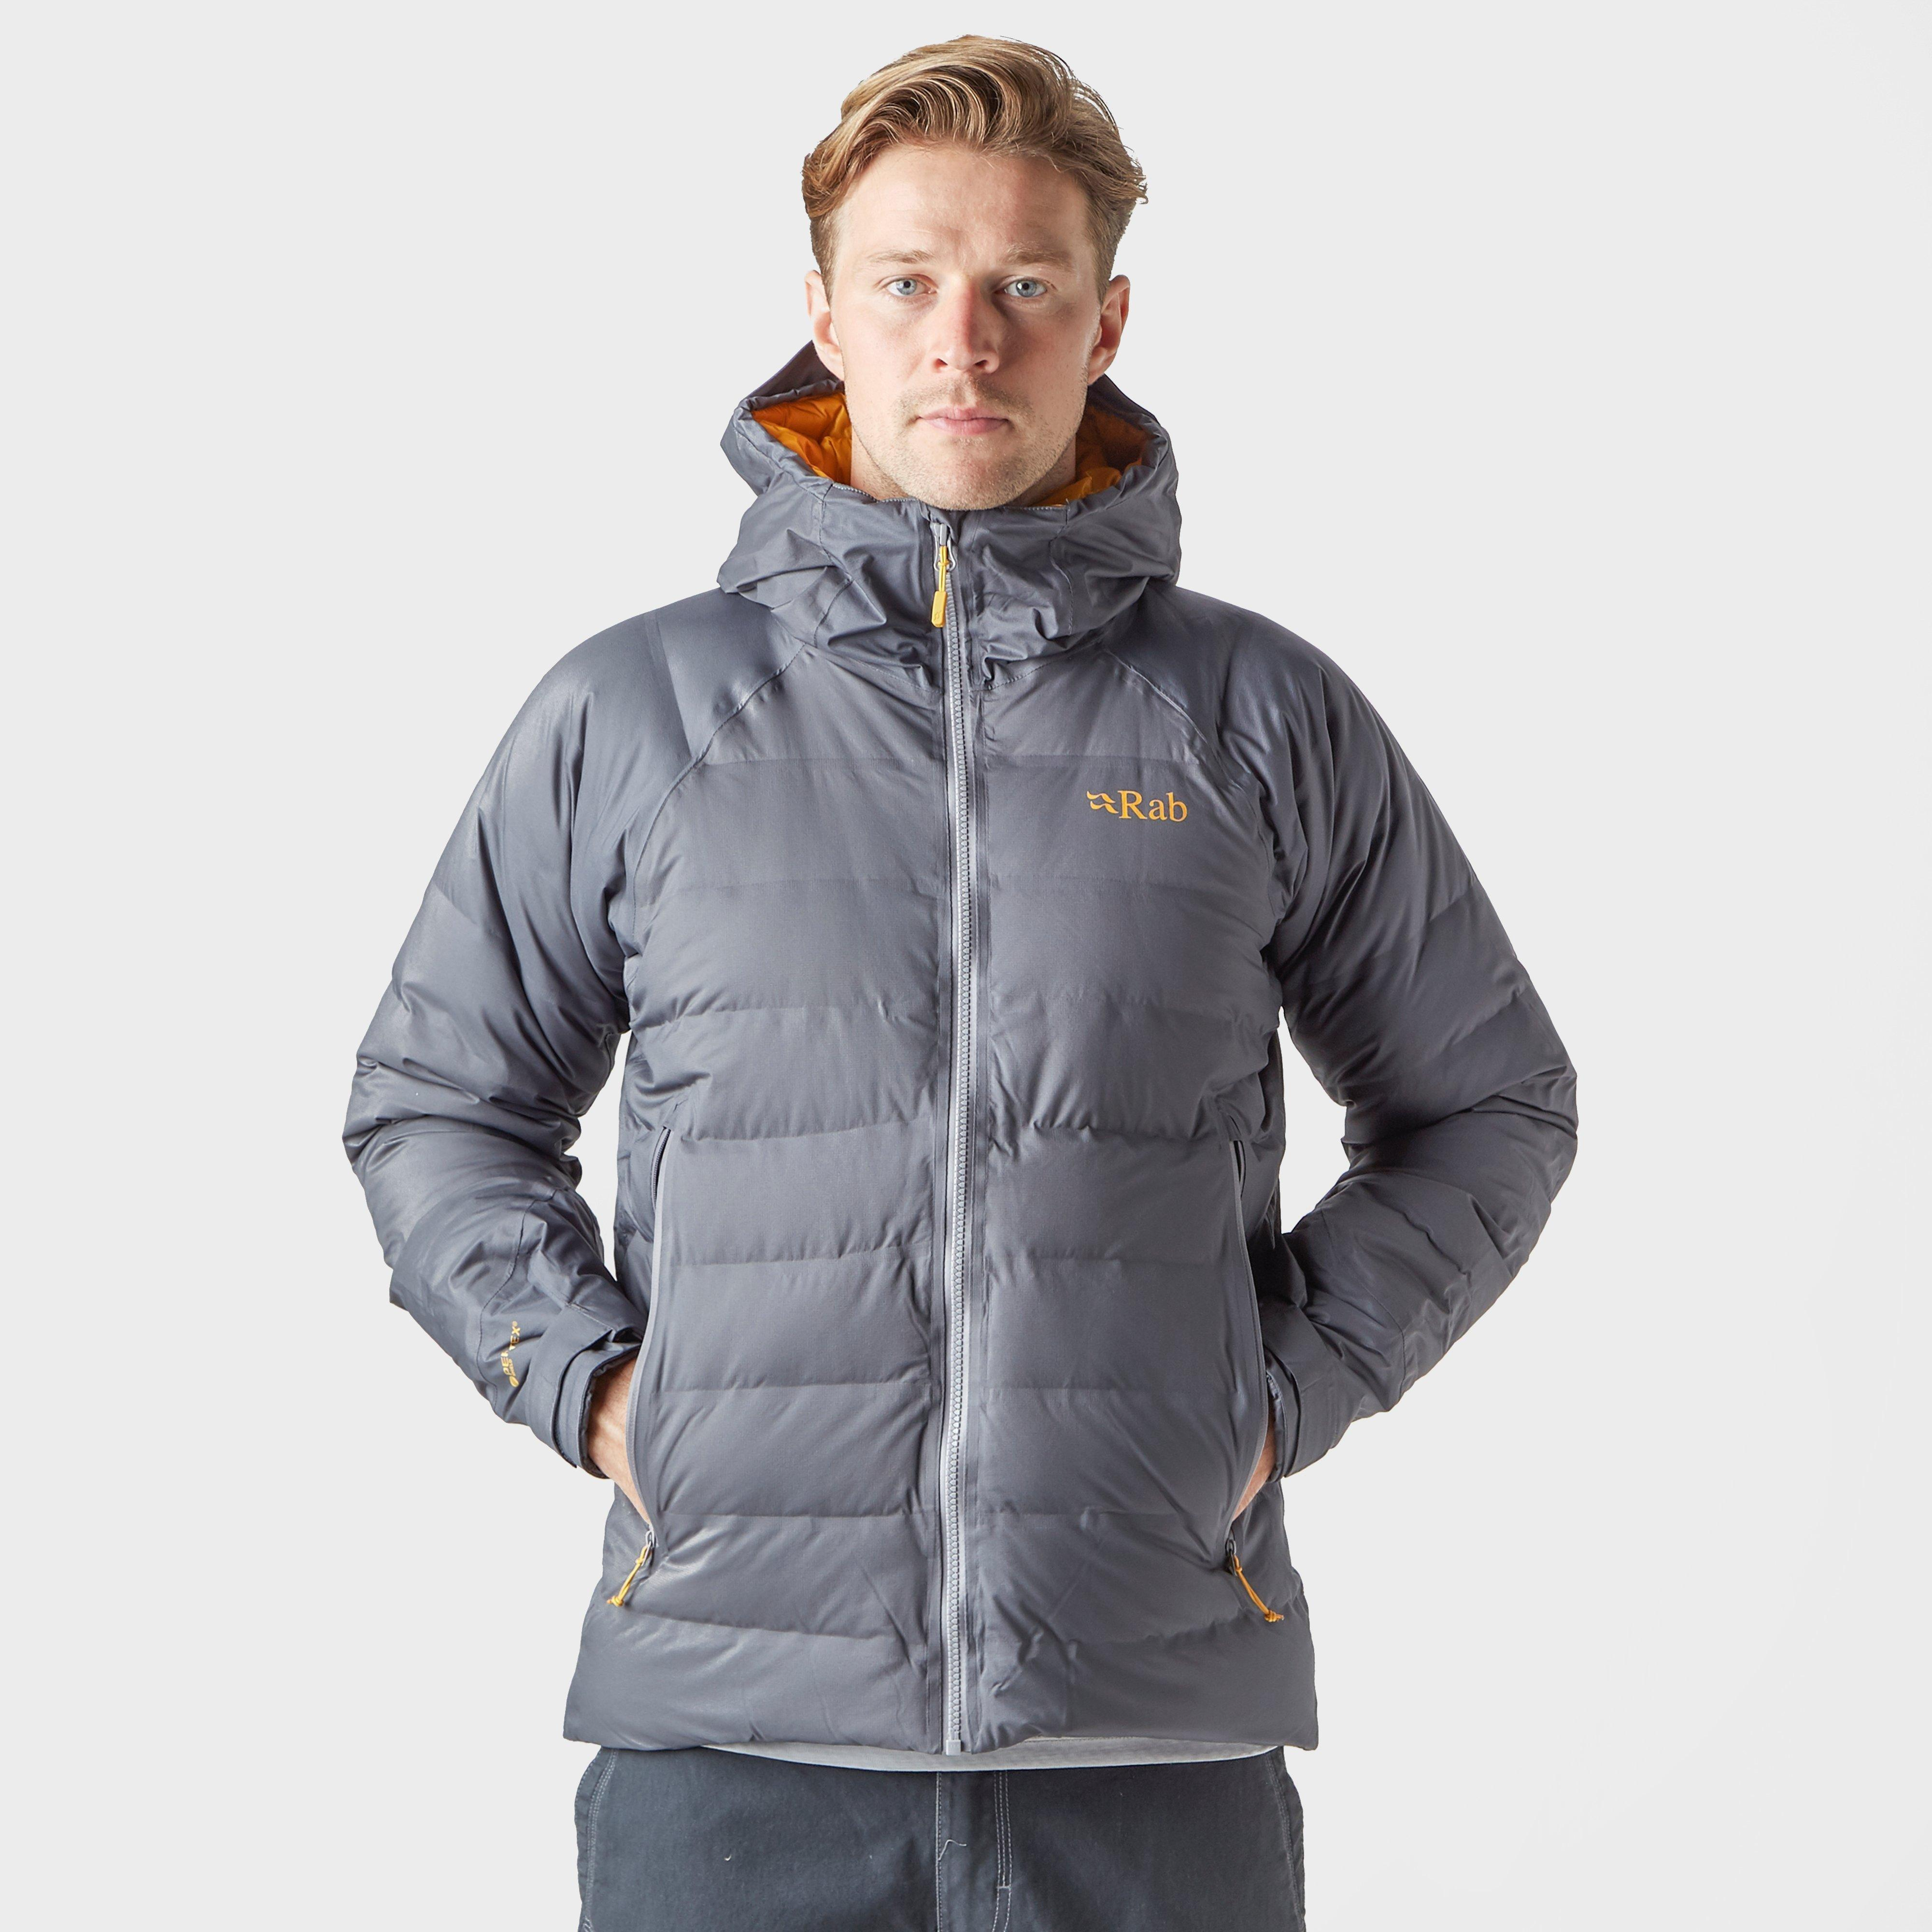 99263b16c Men's Valiance Insulated Jacket